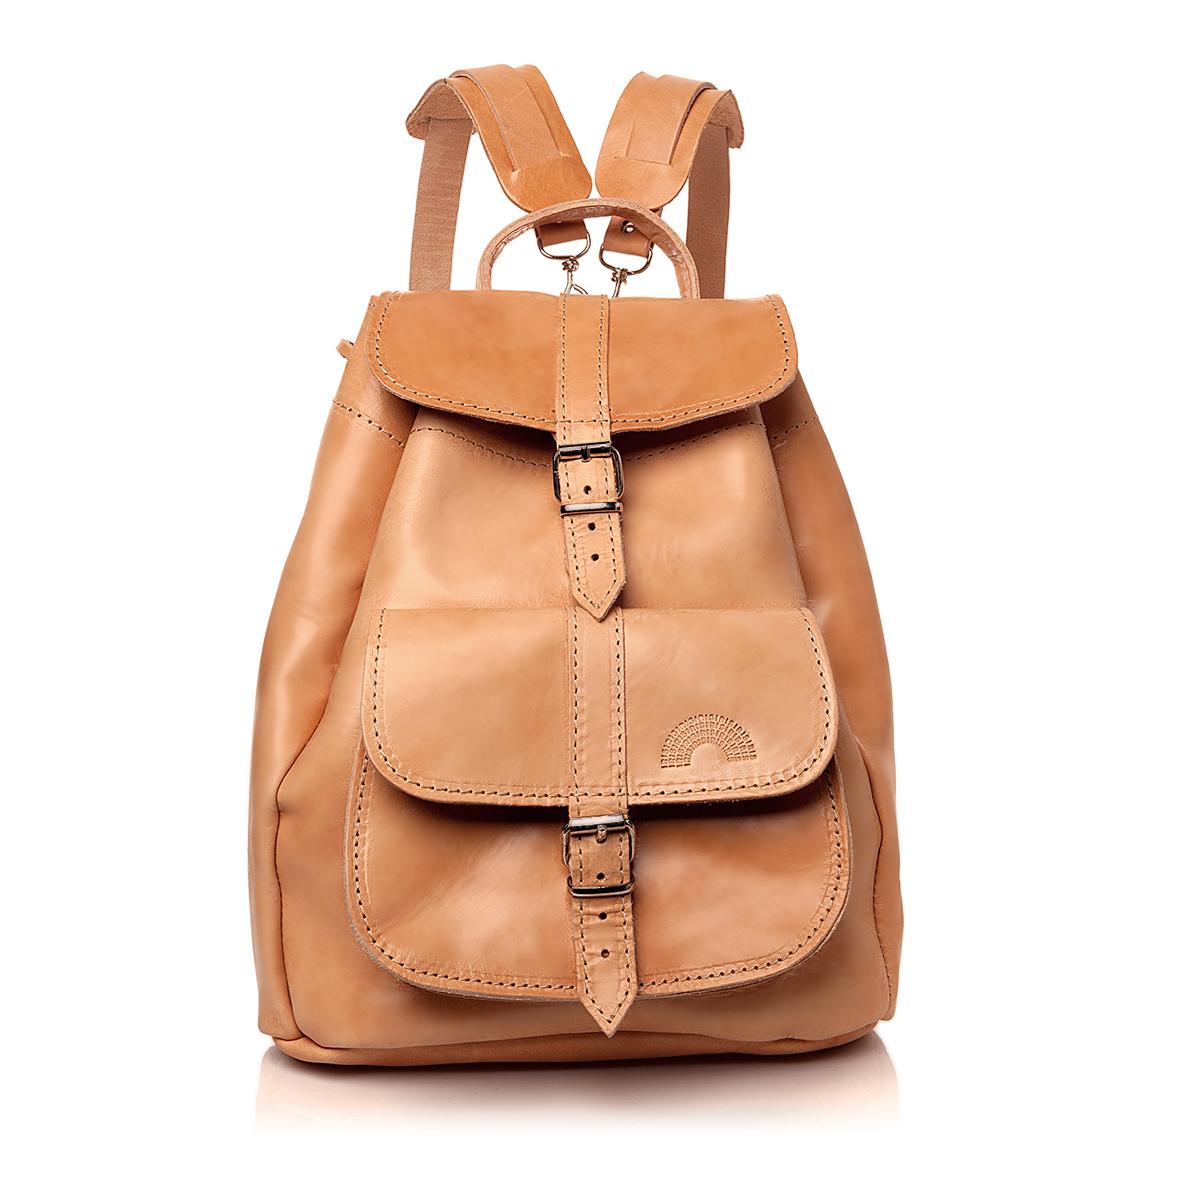 Leather Backpack in Medium - Irisandals